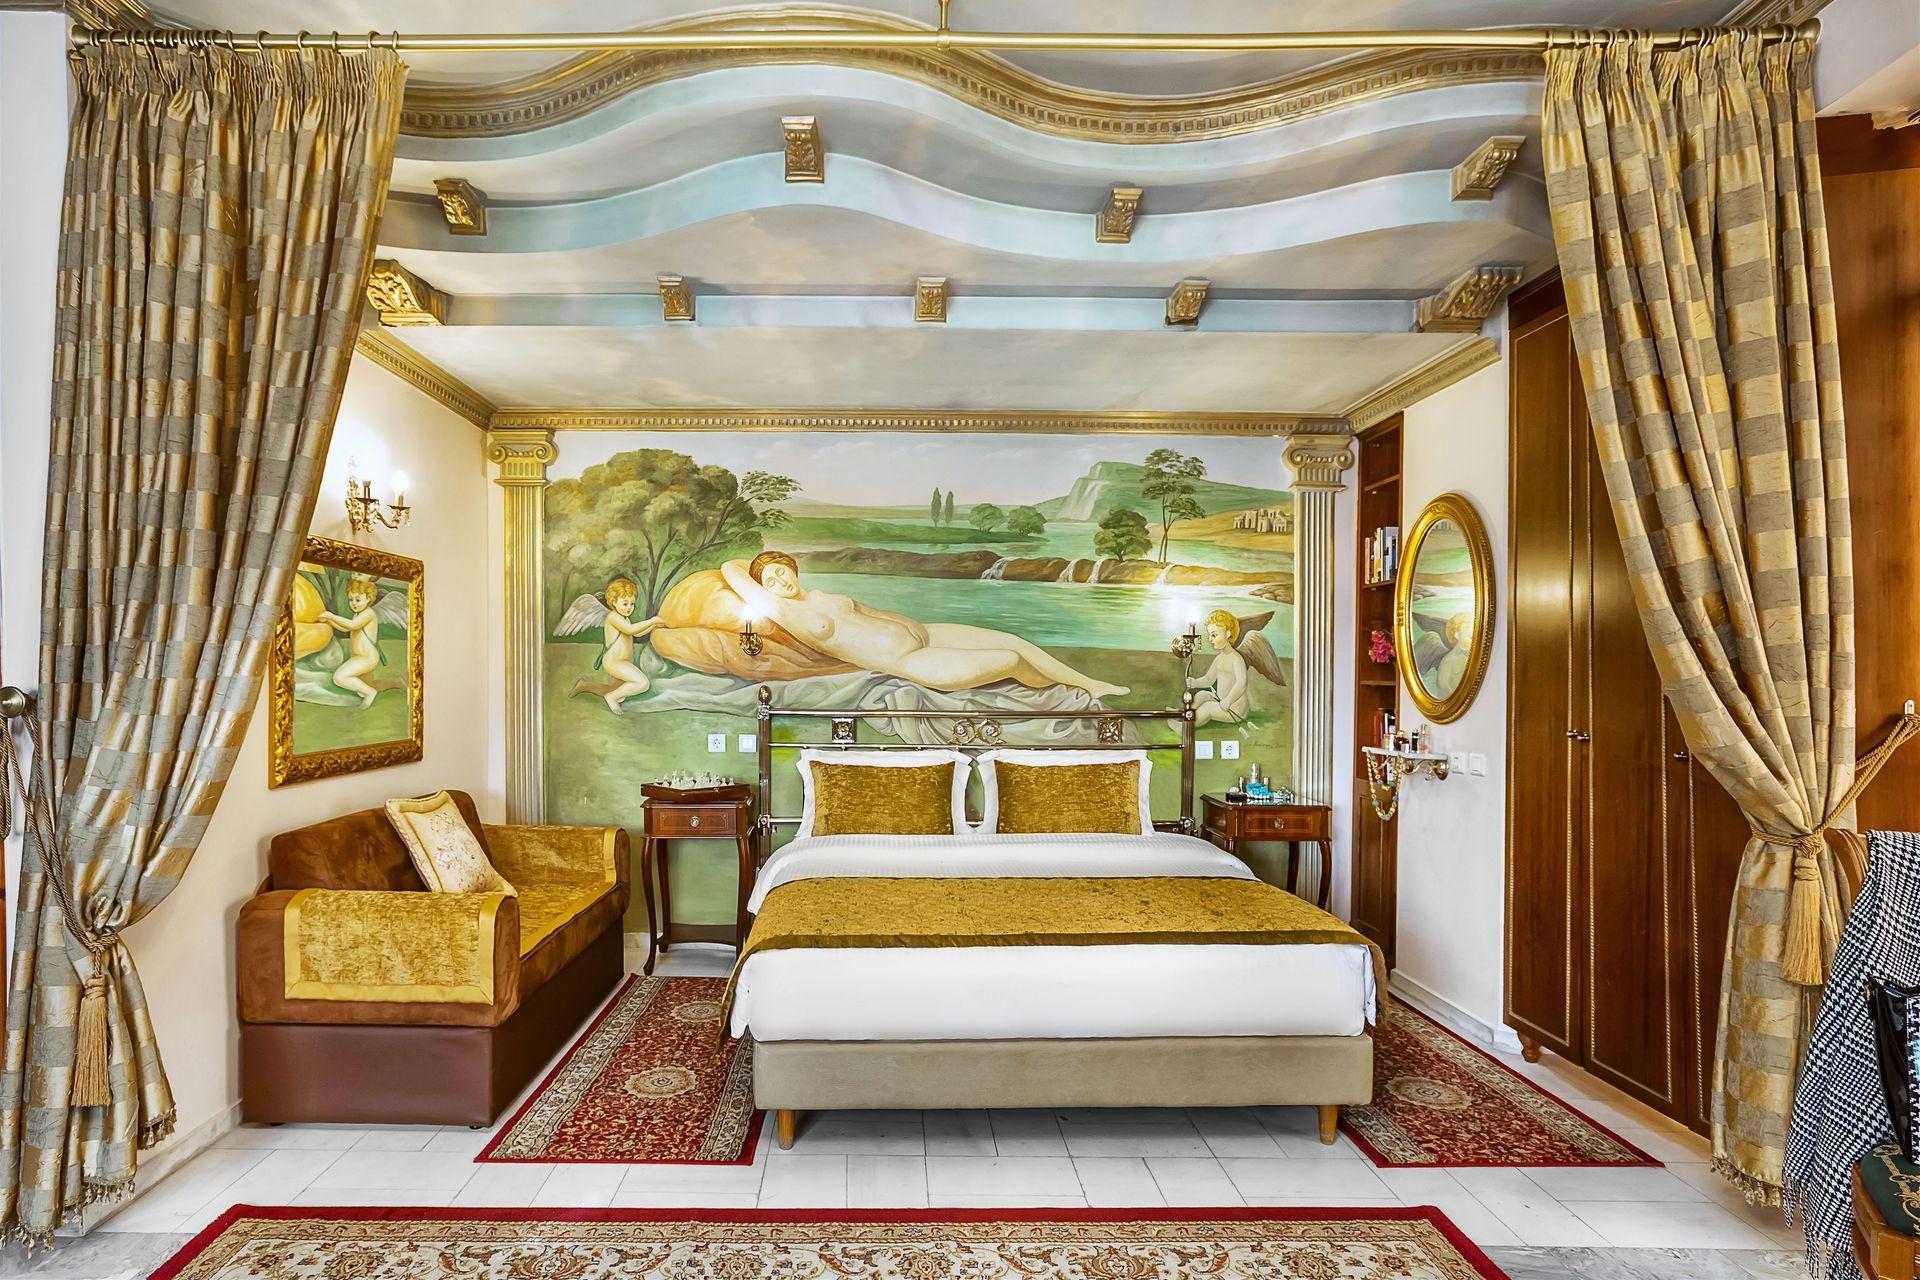 4* a.d. Imperial Palace Hotel - Θεσσαλονικη ✦ 2 Ημερες (1 Διανυκτερευση) ✦ 2 ατομα ✦ Πρωινο ✦ εως 30/04/2020 ✦ Free WiFi